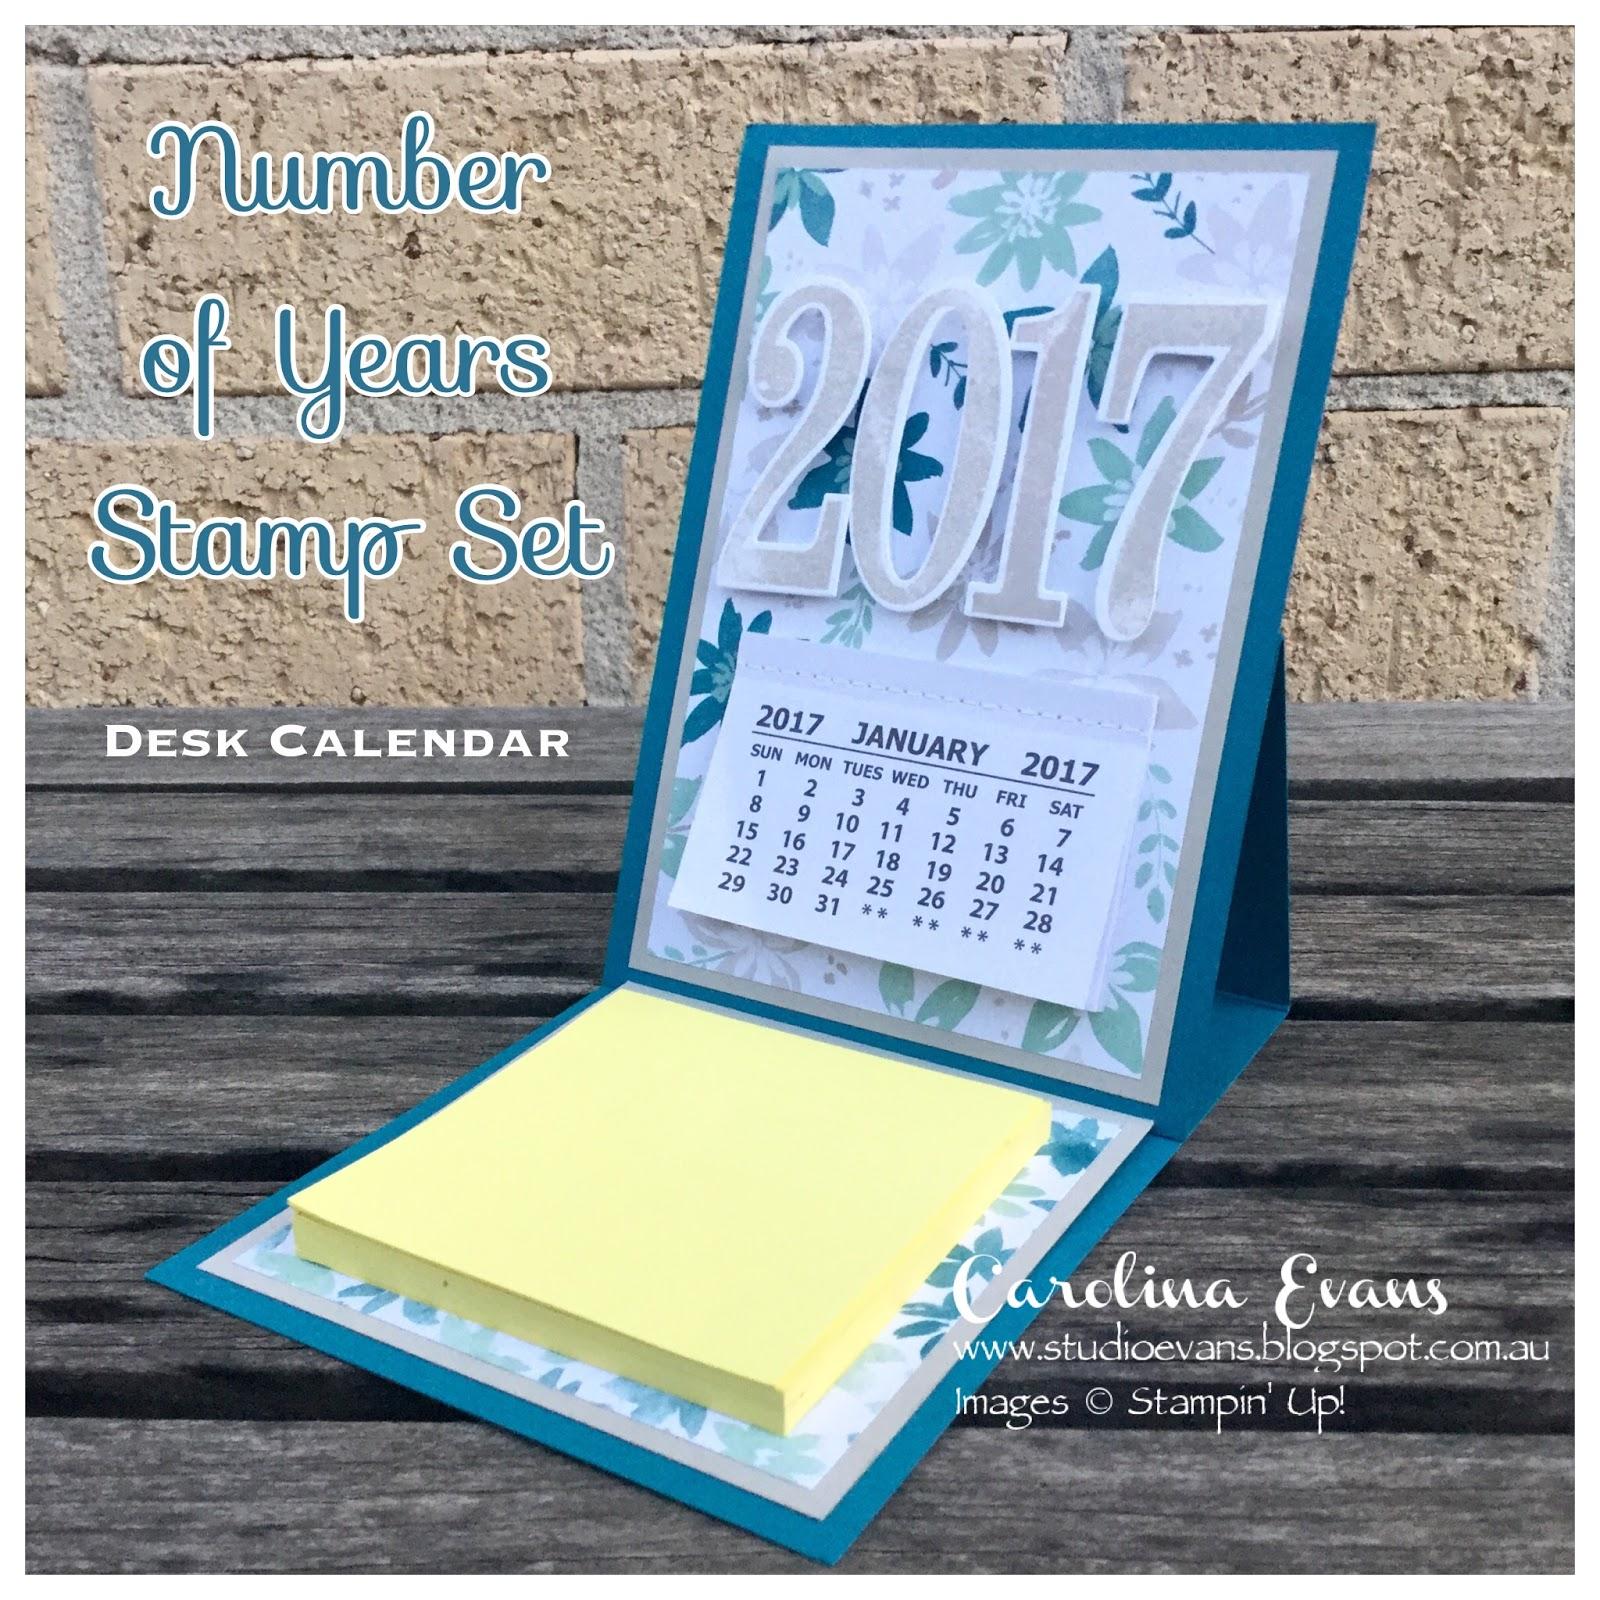 Linda KS Stampin Page Stampin UpS Best Year Ever Easel